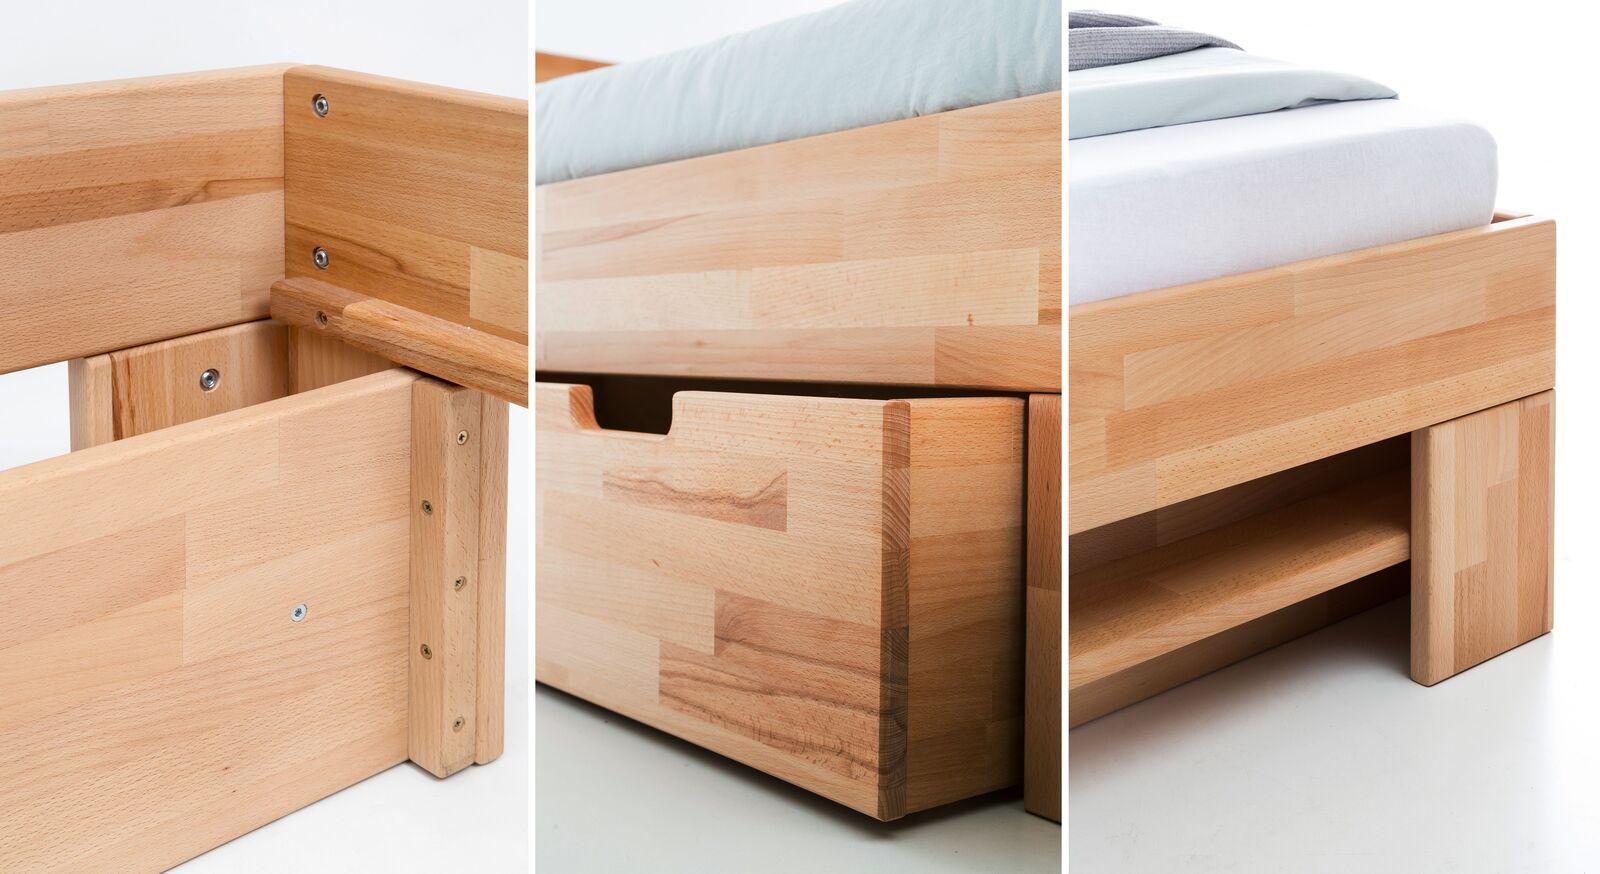 Qualitativ hochwertiges Schubkasten-Bett Valisia